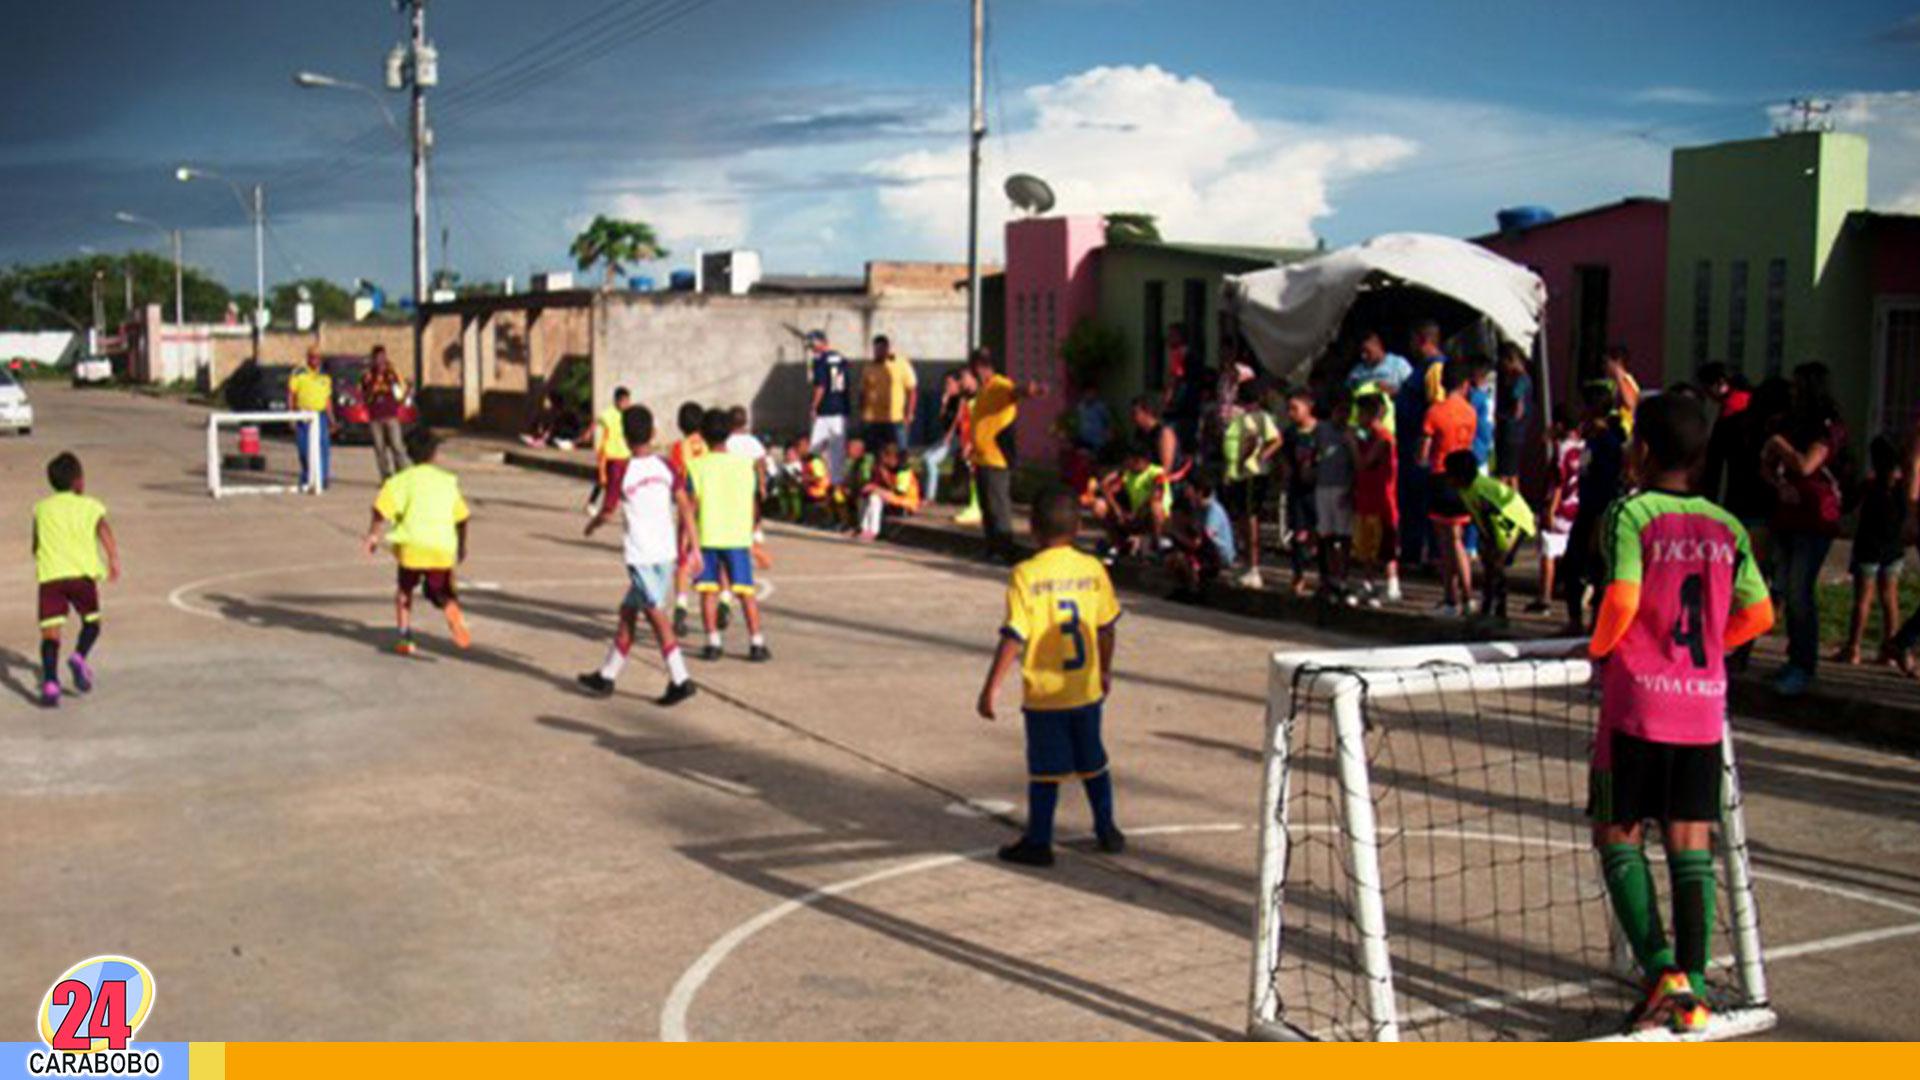 Futbolito en Venezuela – futbolito en Venezuela